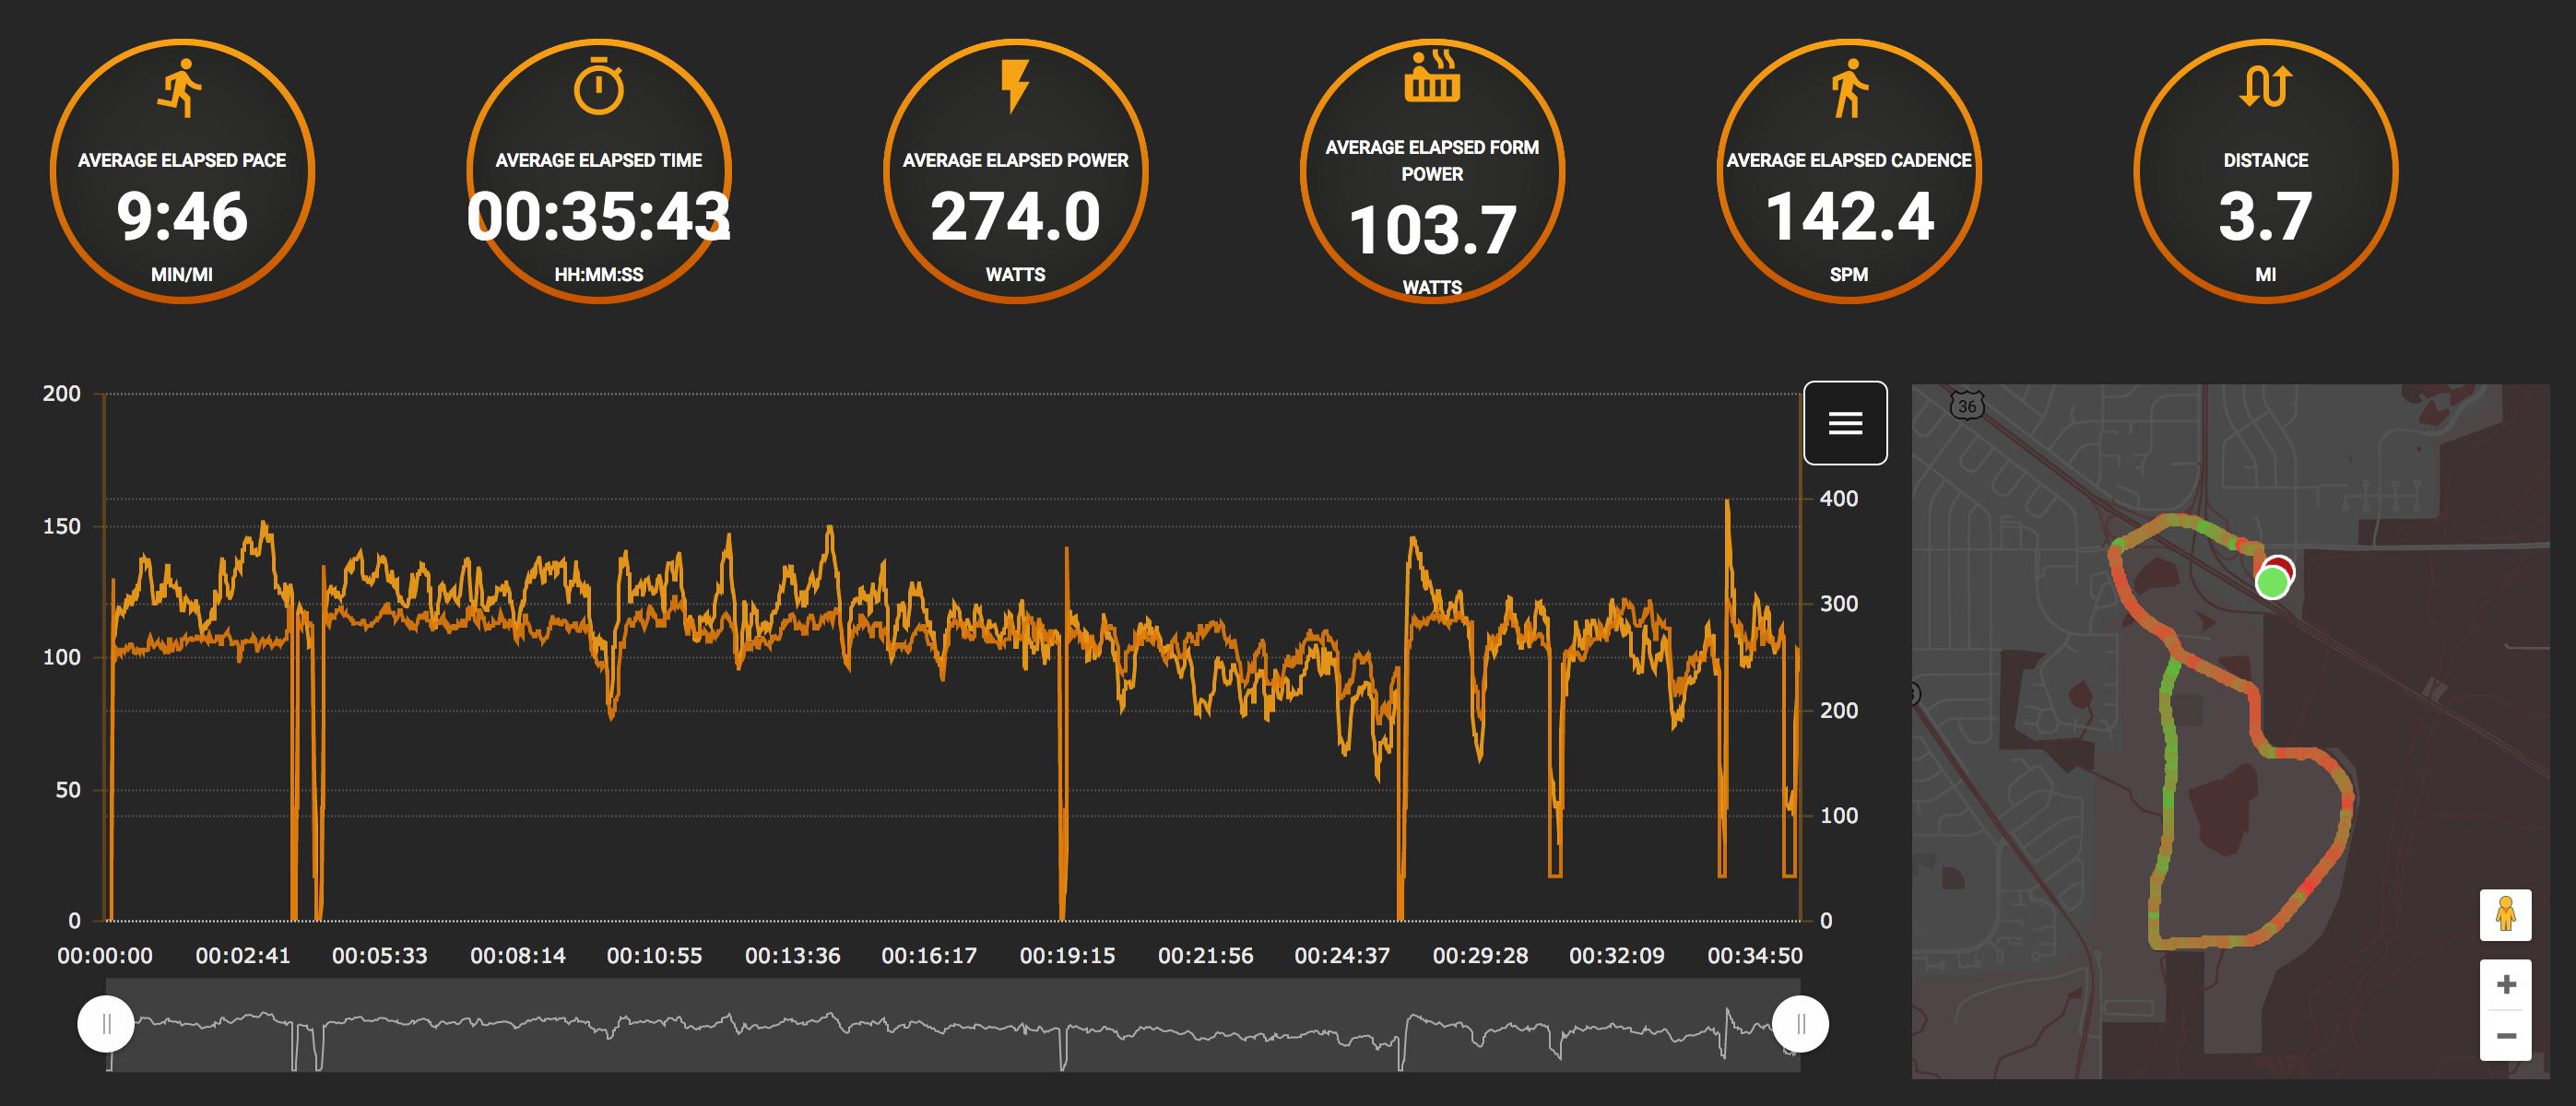 Running Stress Score